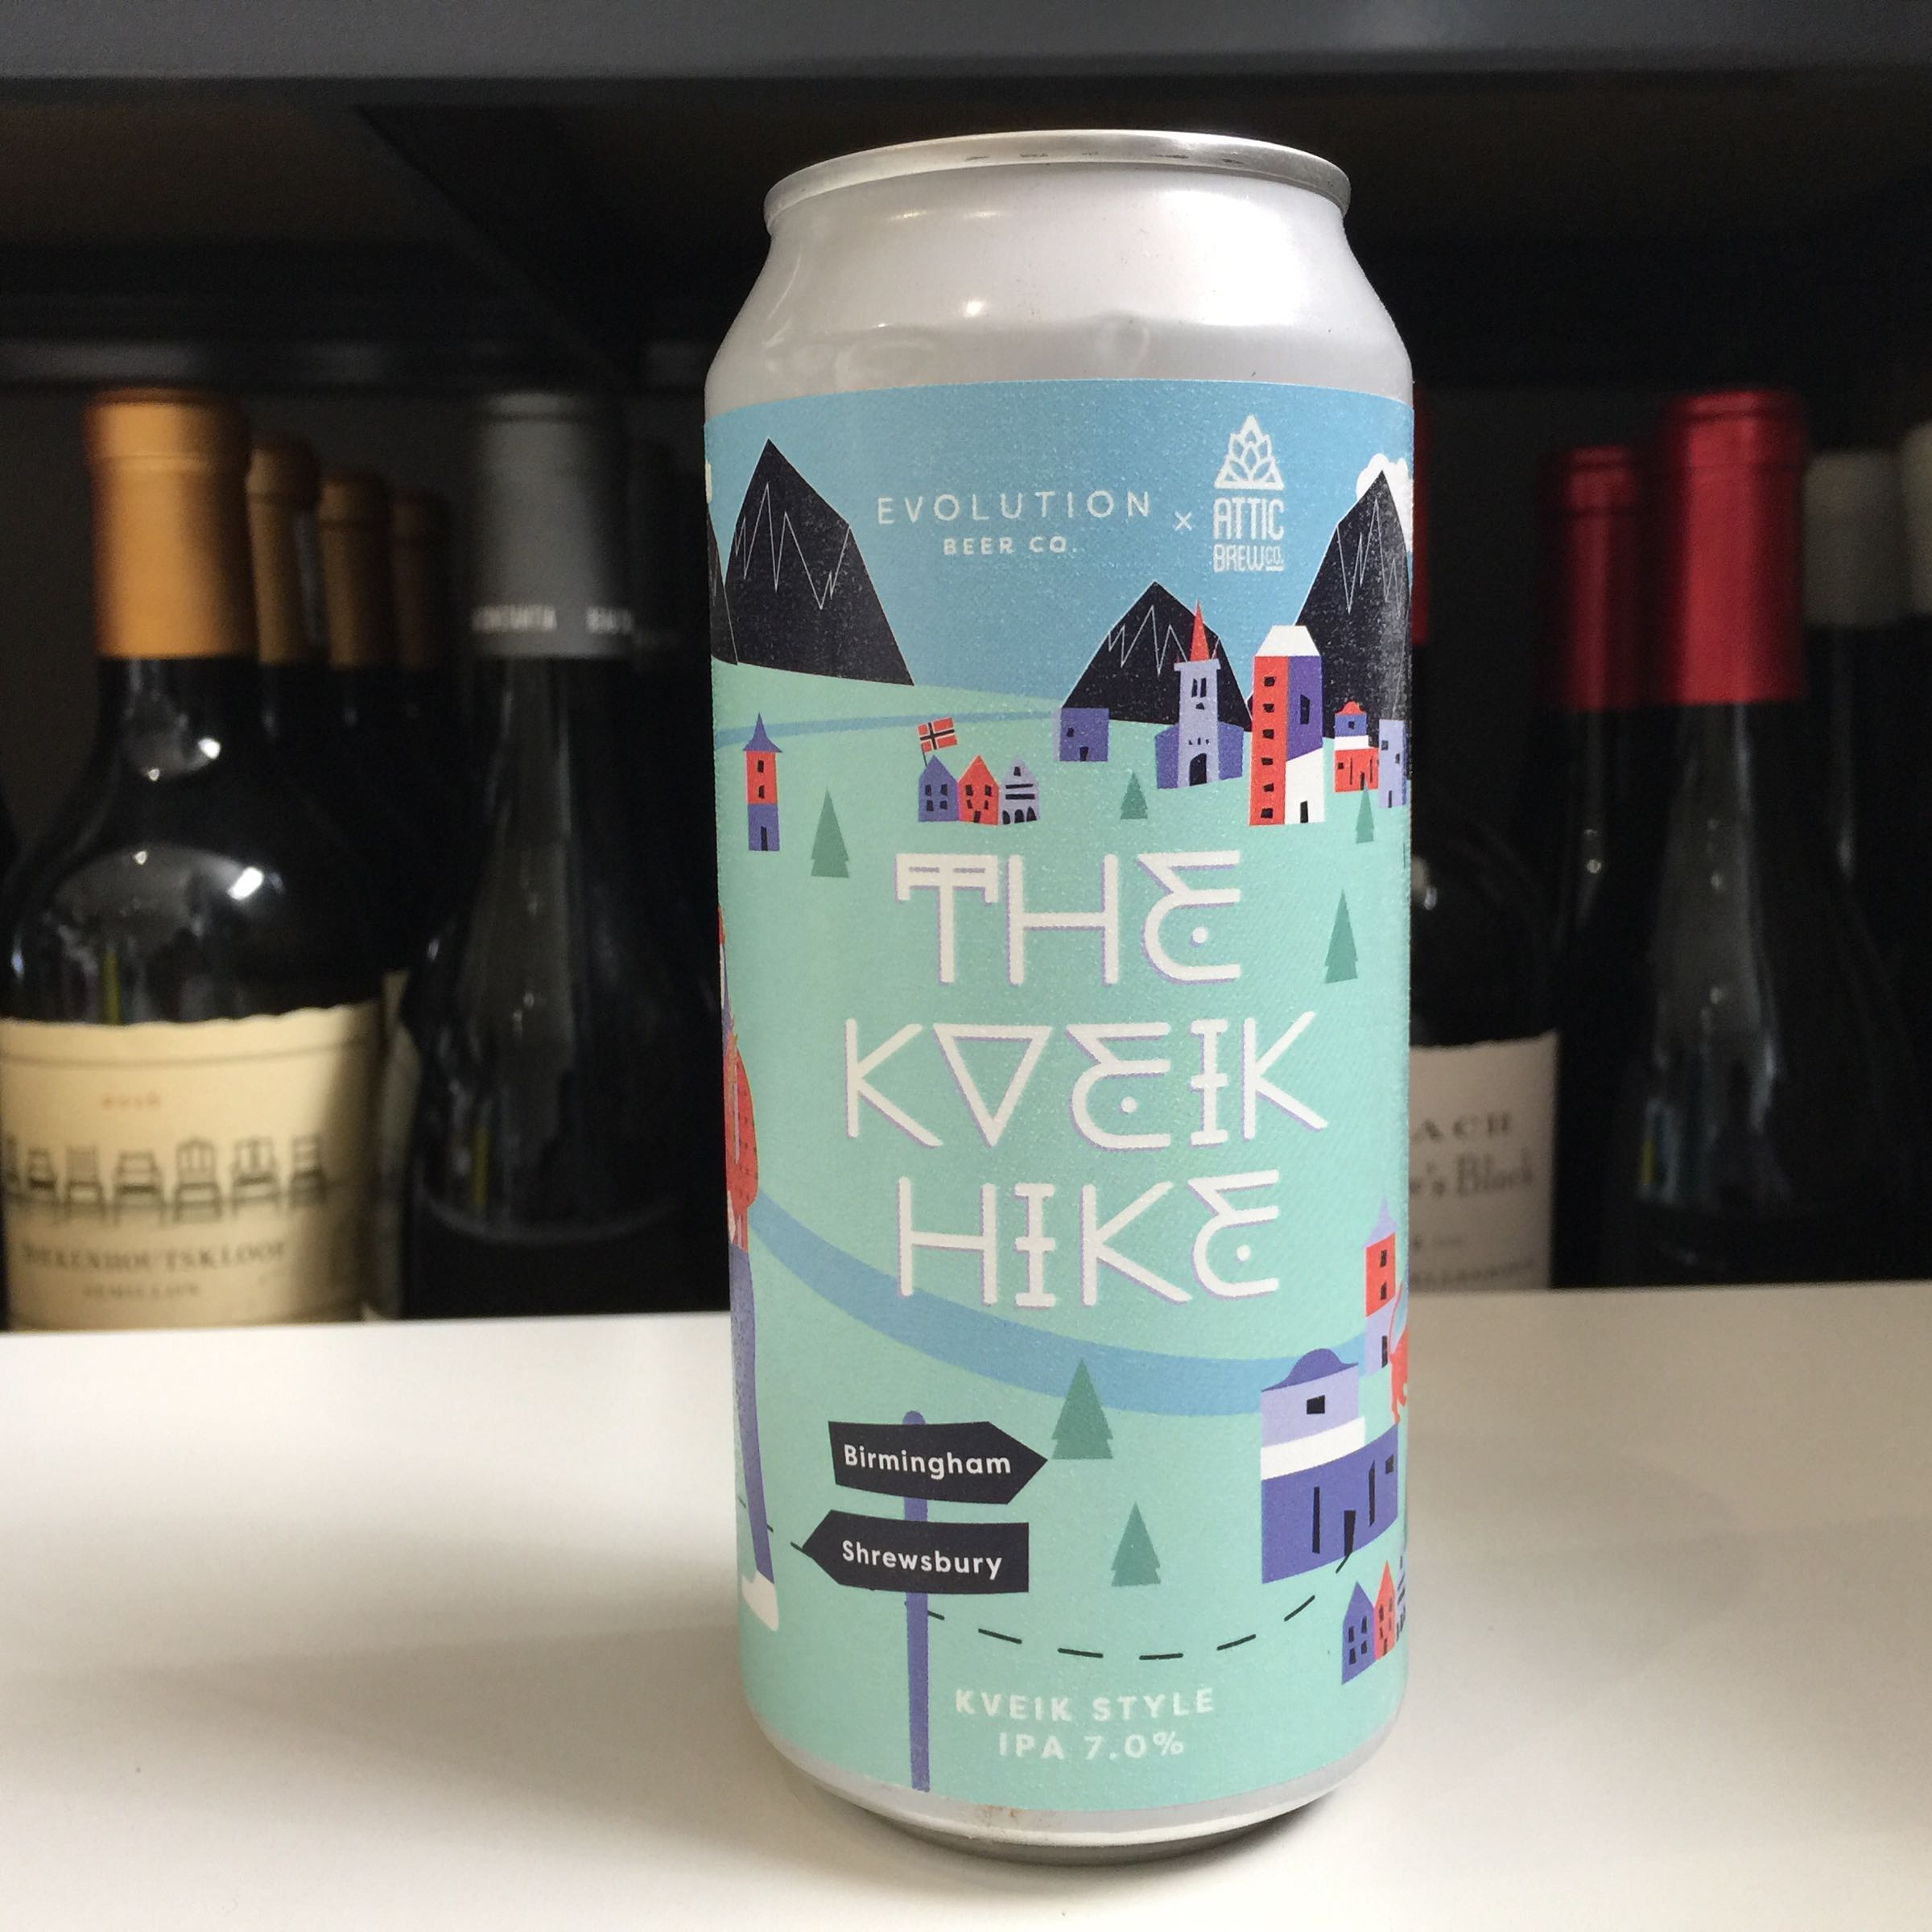 Evolution Beer 'The Kveik Hike' IPA 440ml 7% ABV